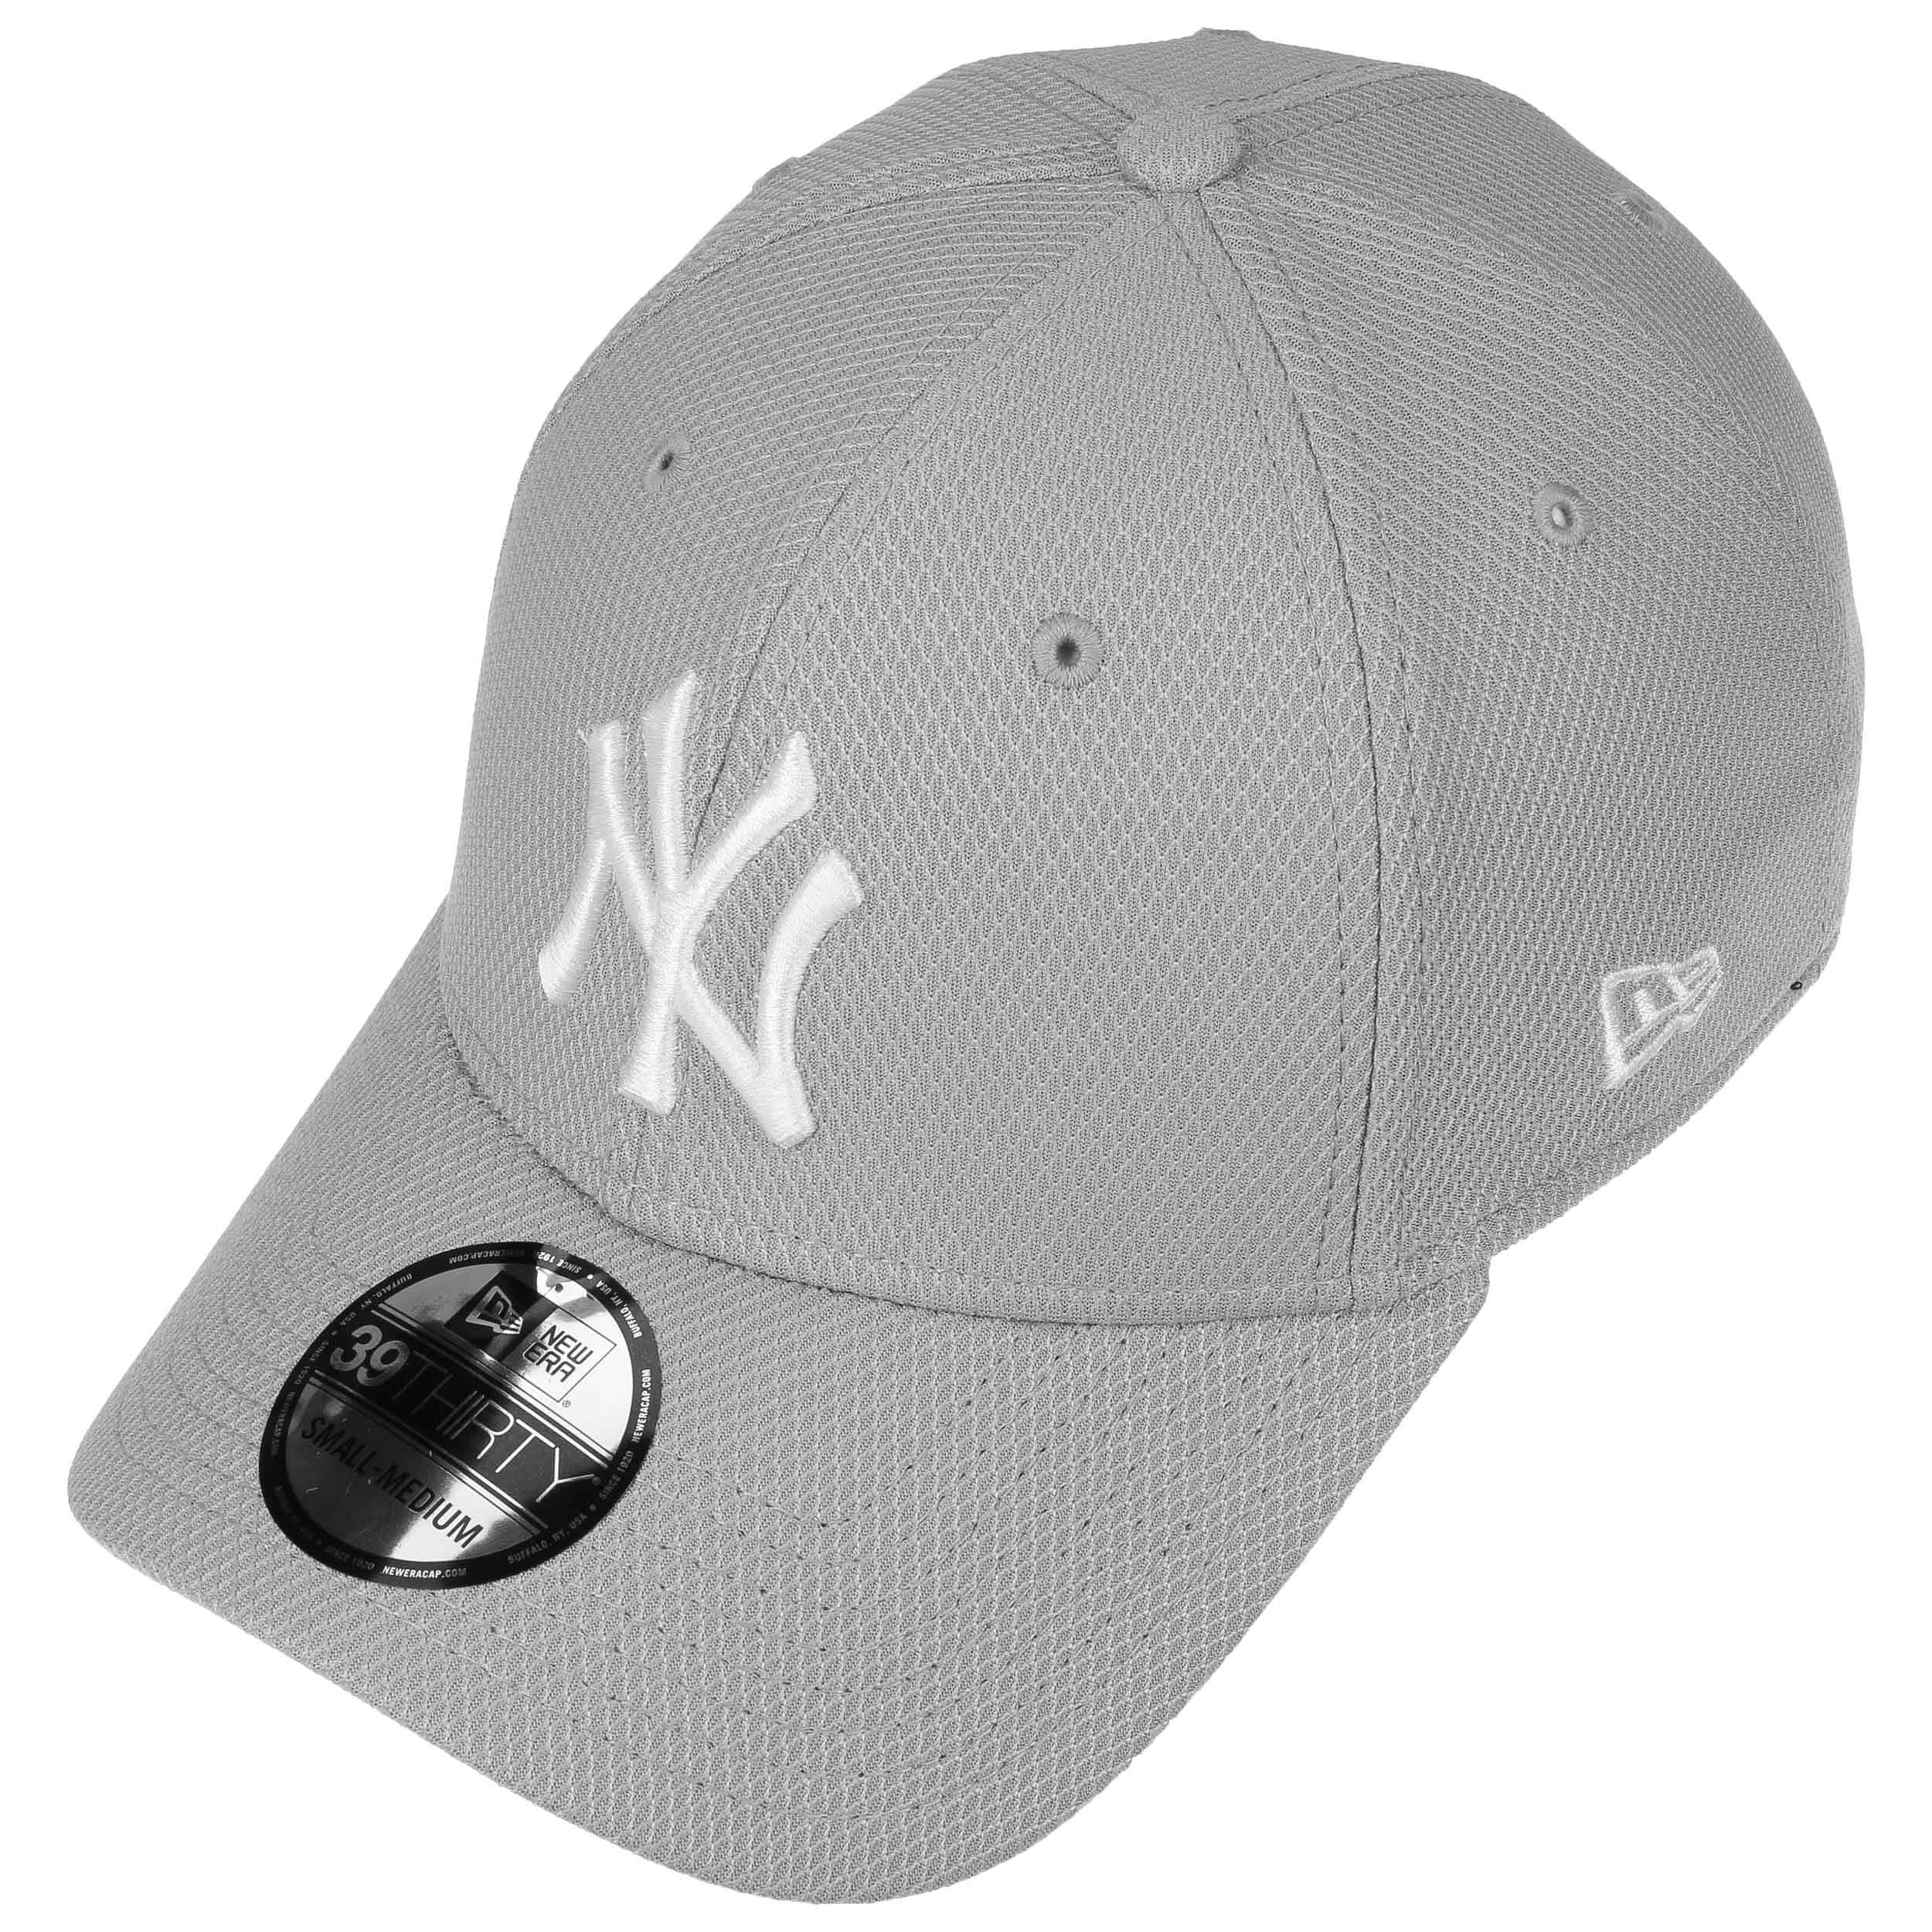 39Thirty Diamond Yankees Cap by New Era - grey 1 ... 776dd28ccd4